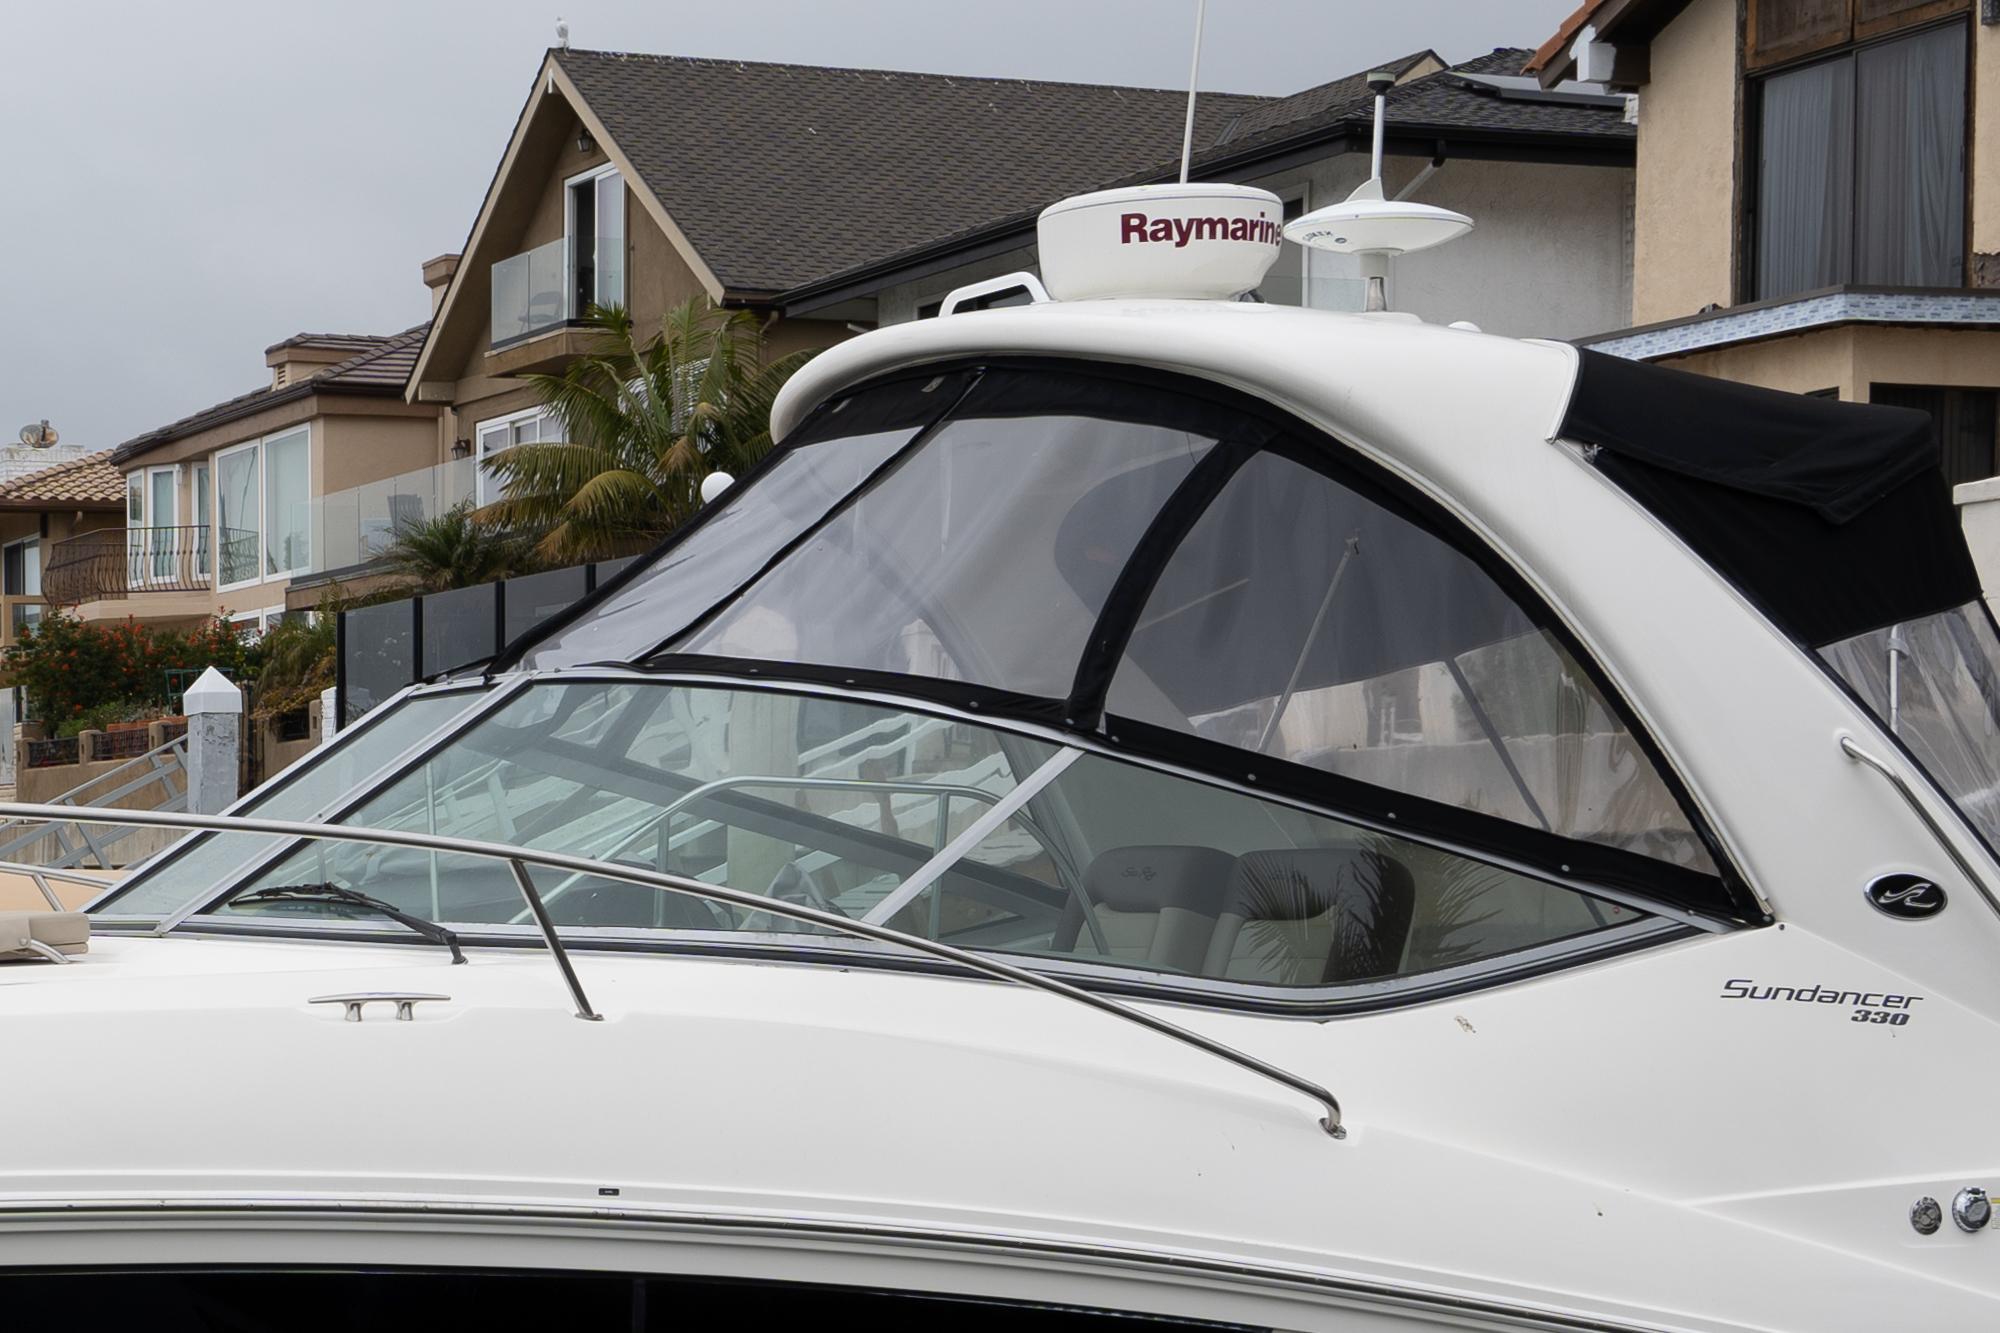 2014 Sea Ray 330 Sundancer #TB2287RM-LLC inventory image at Sun Country Coastal in San Diego